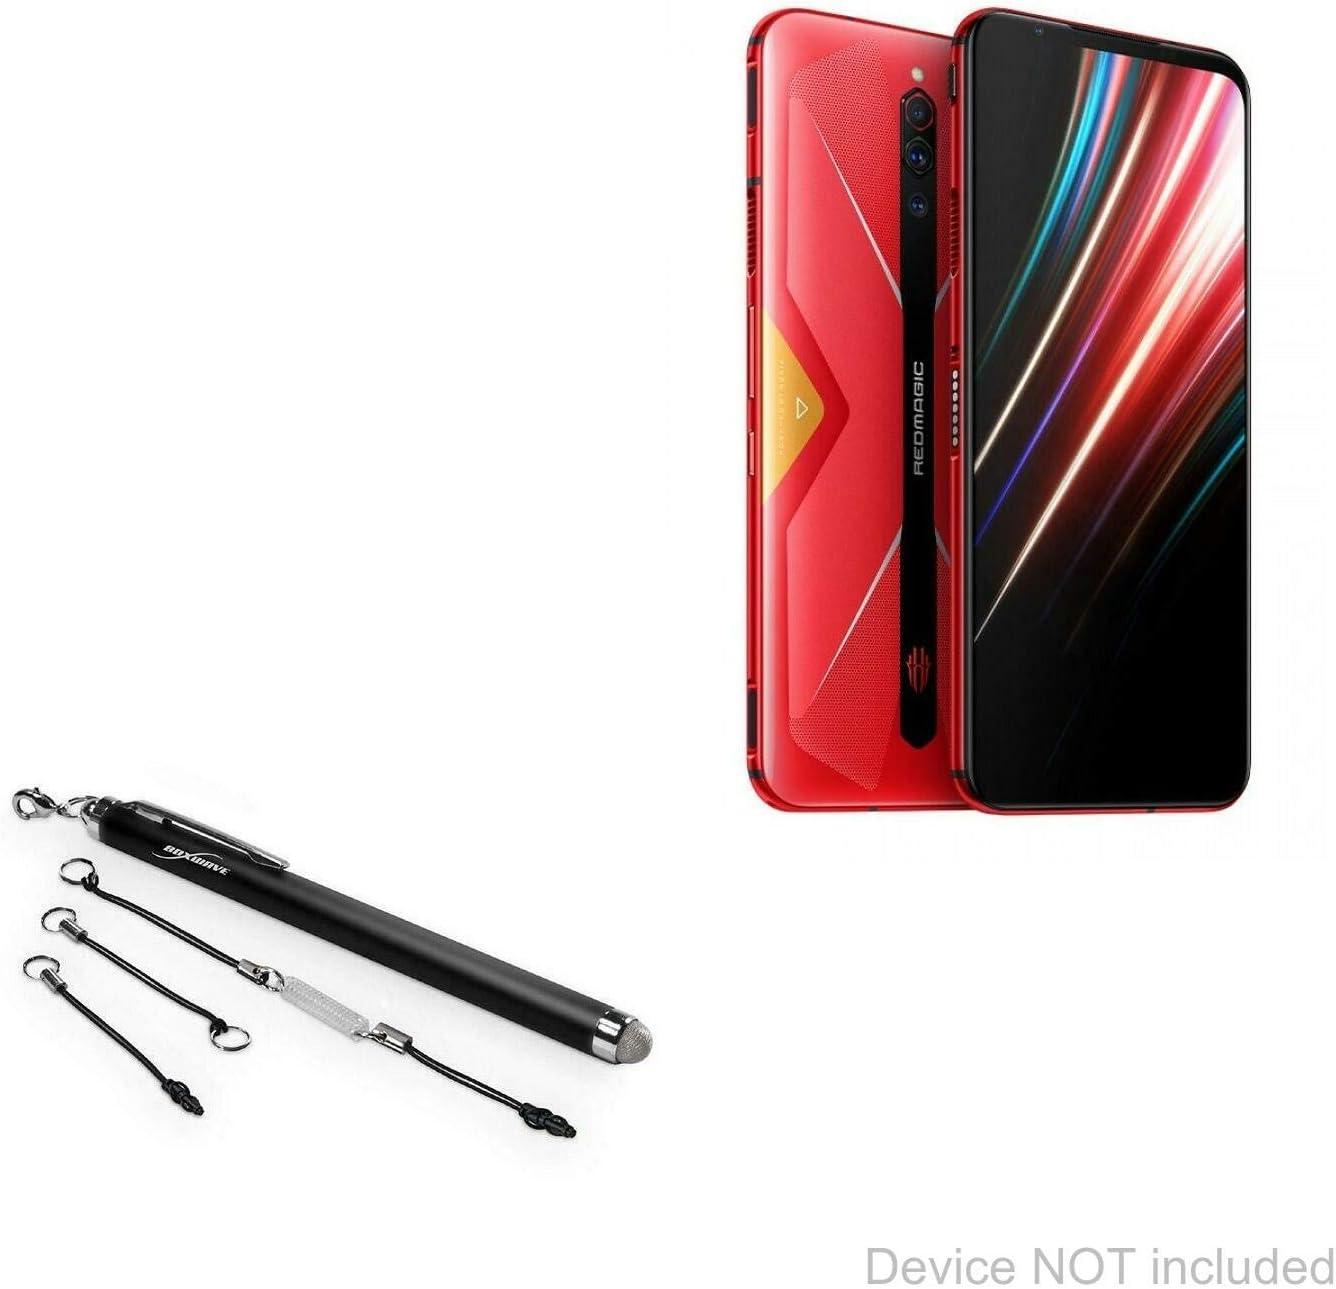 FineTouch Capacitive Stylus Jet Black Super Precise Stylus Pen for Teguar TM-5557 Teguar TM-5557 Stylus Pen BoxWave